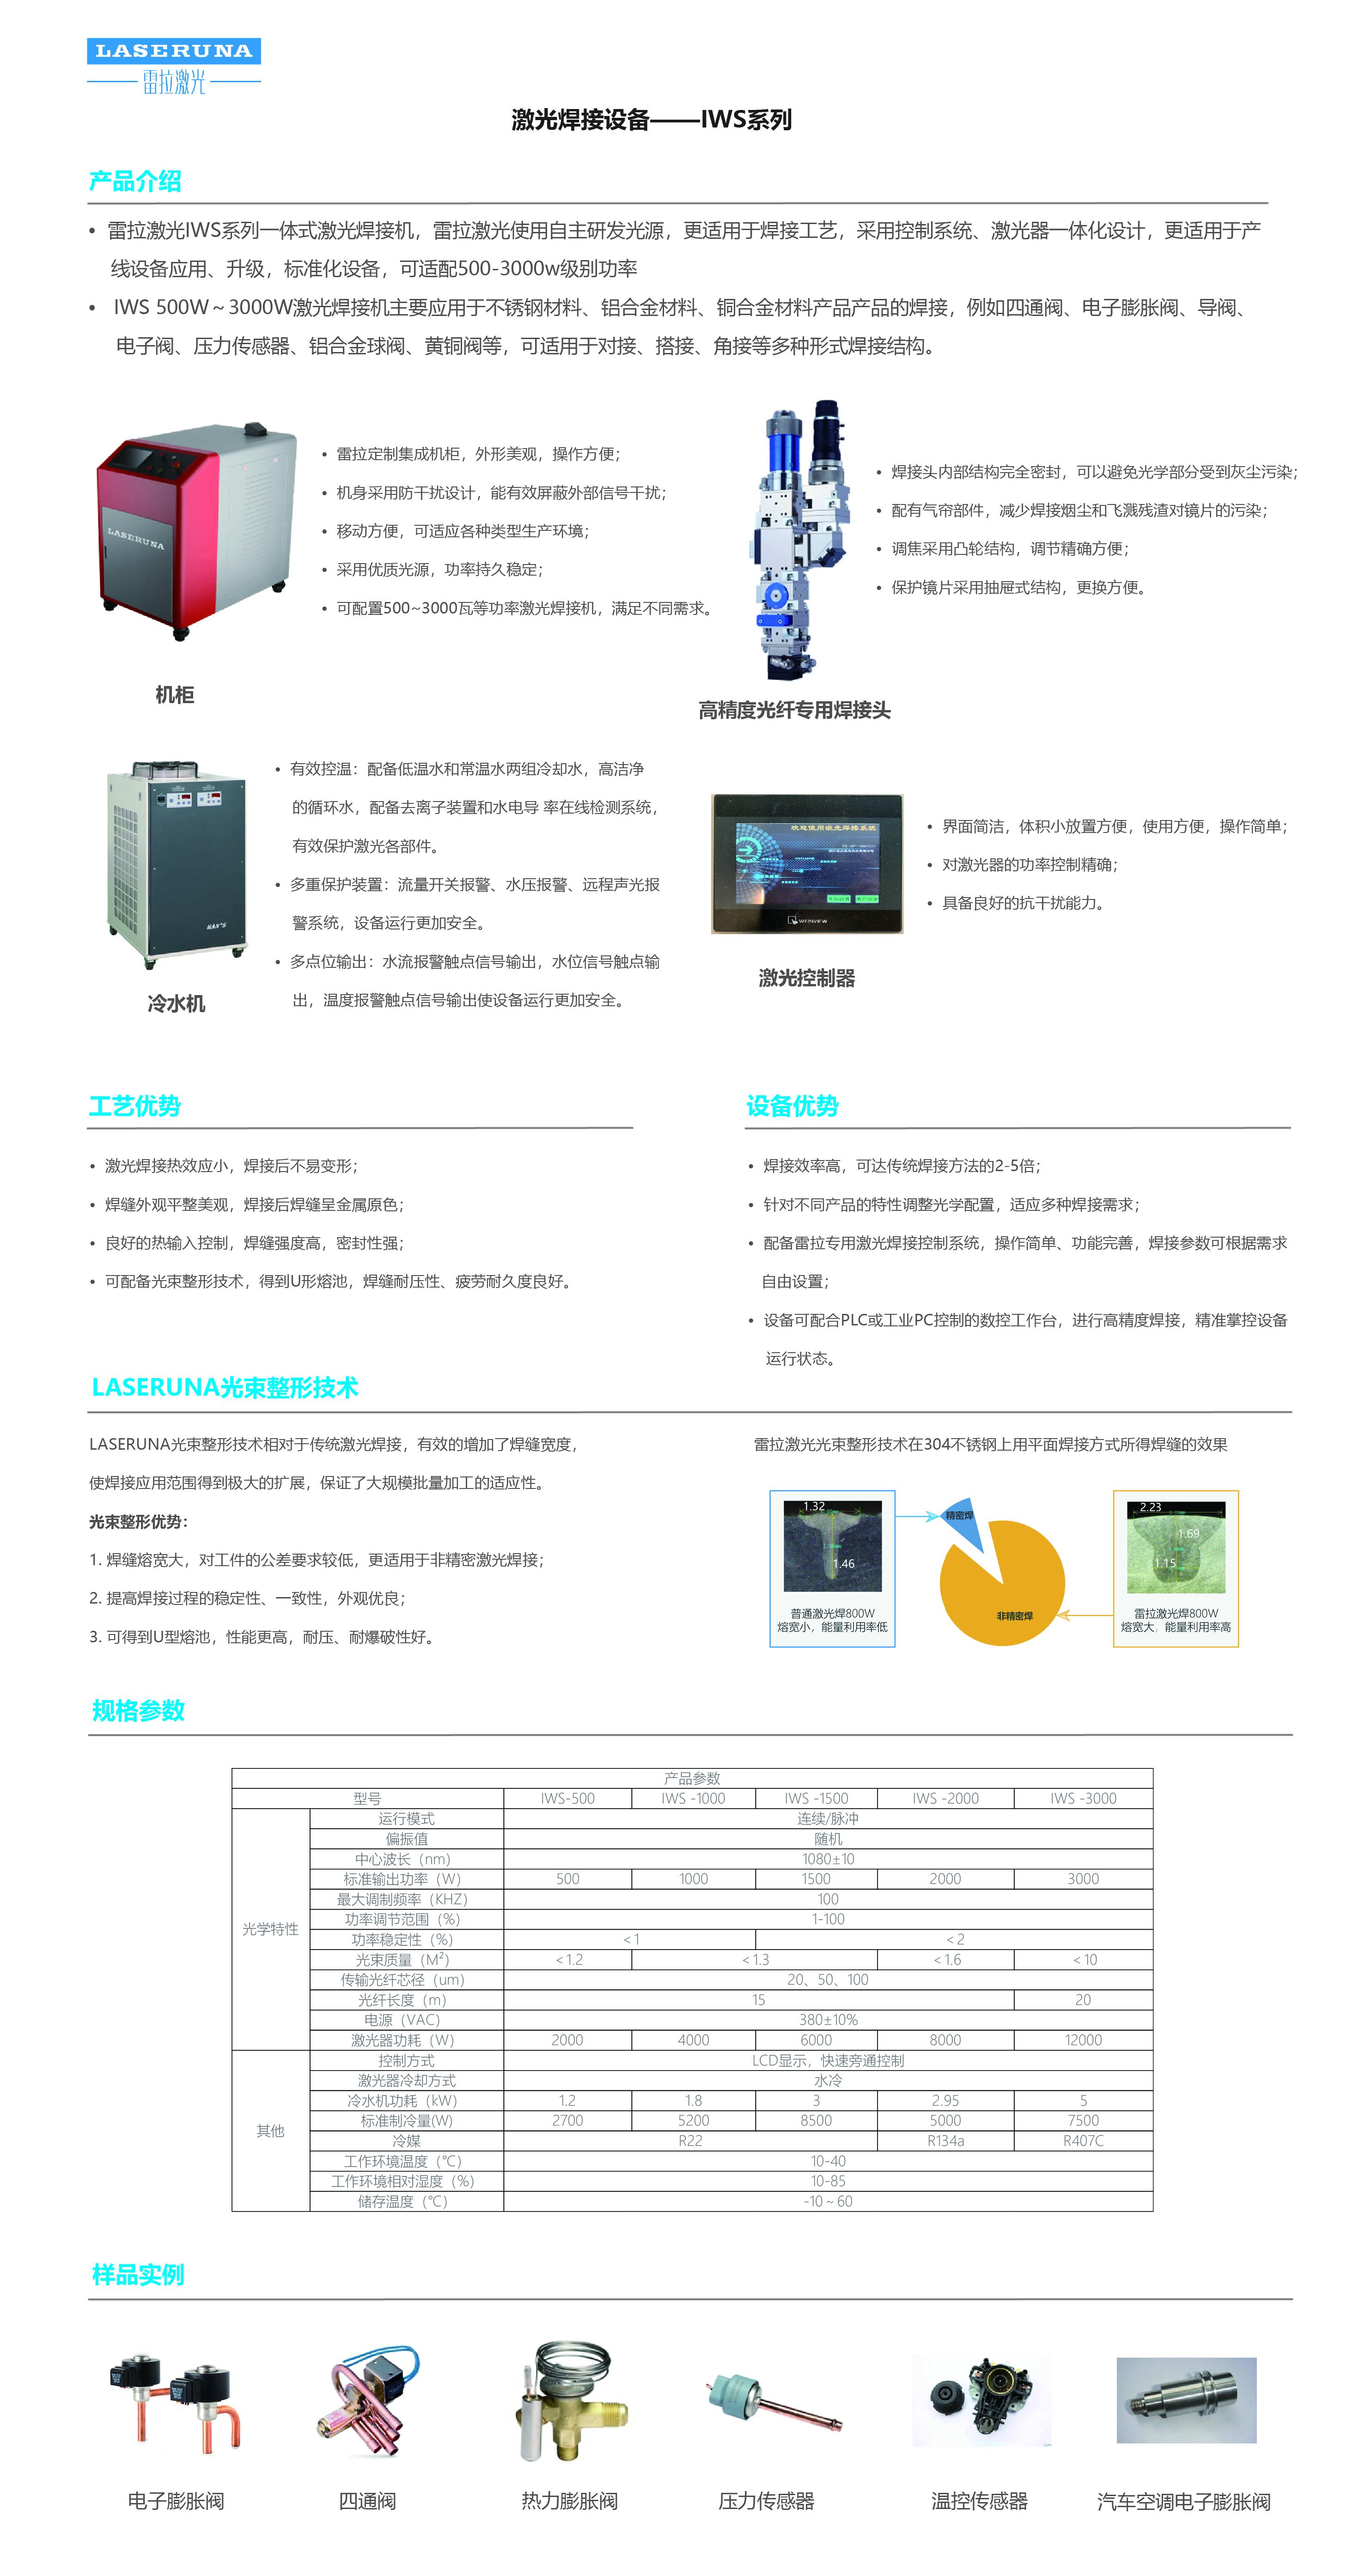 vwin ac米兰焊接设备——IWS系列(500-3000)_画板 1